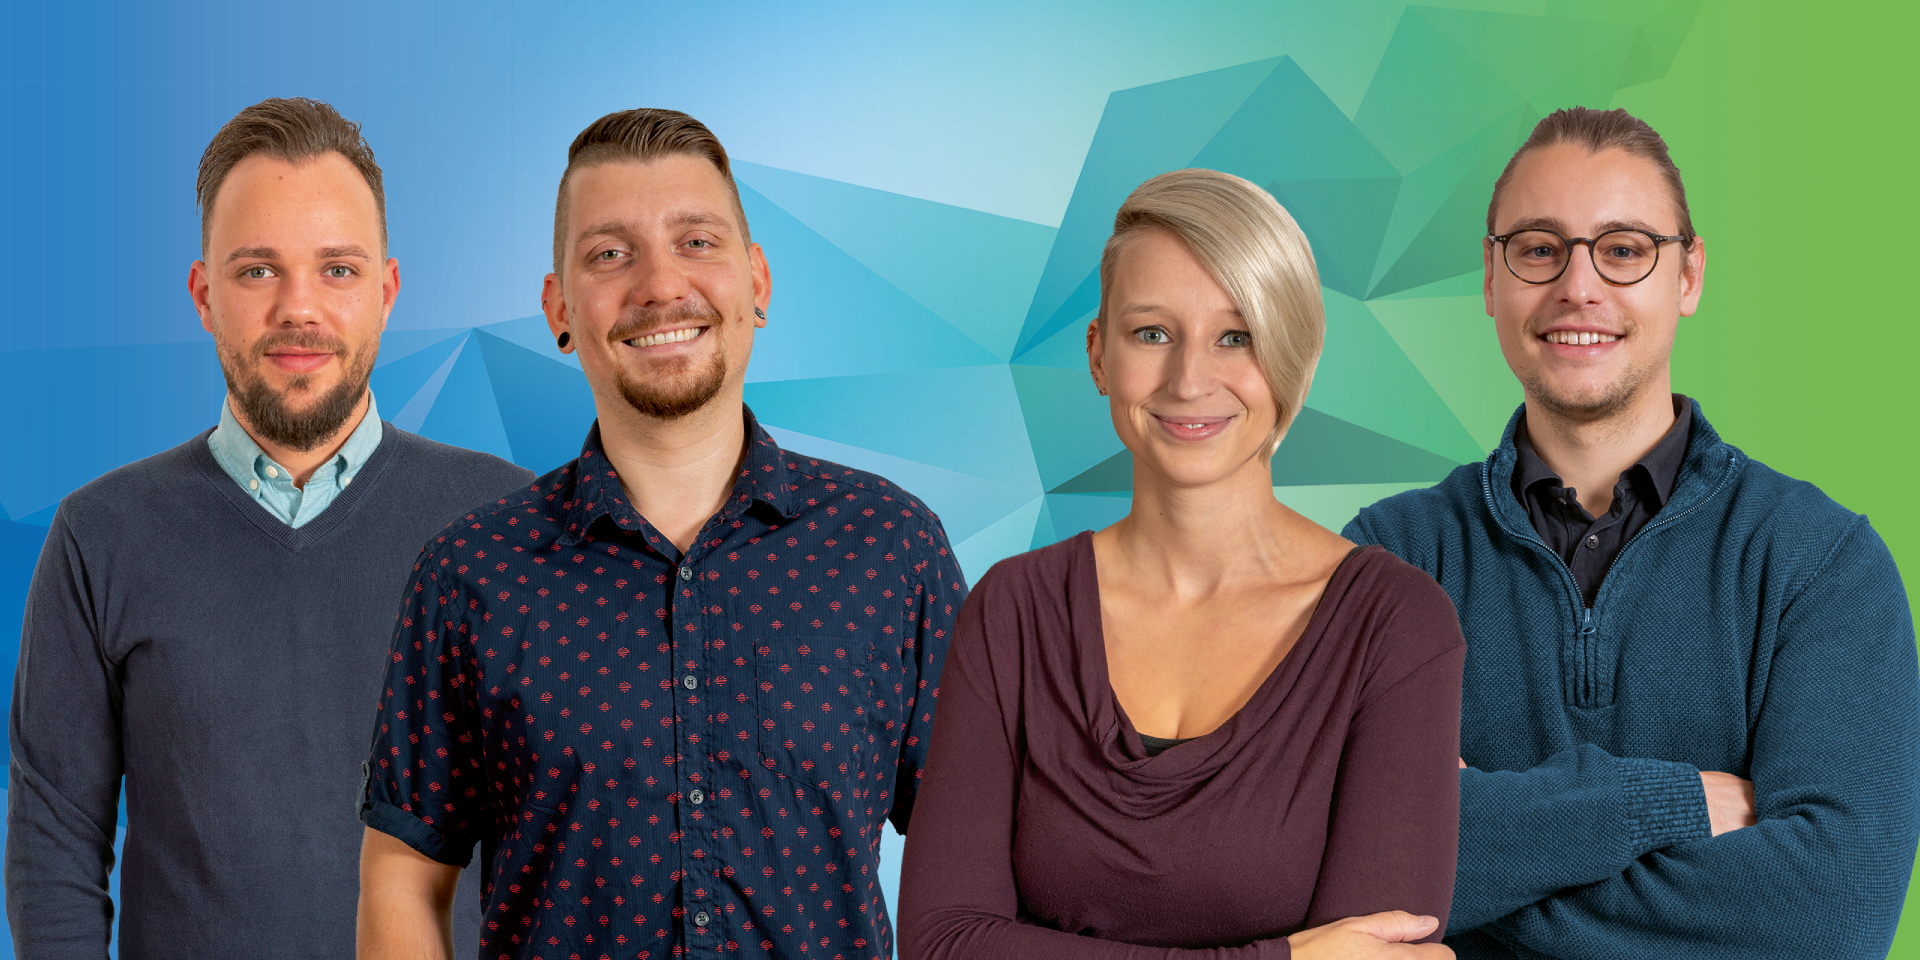 Spannende IT-Jobs bei der profi.com AG in Dresden